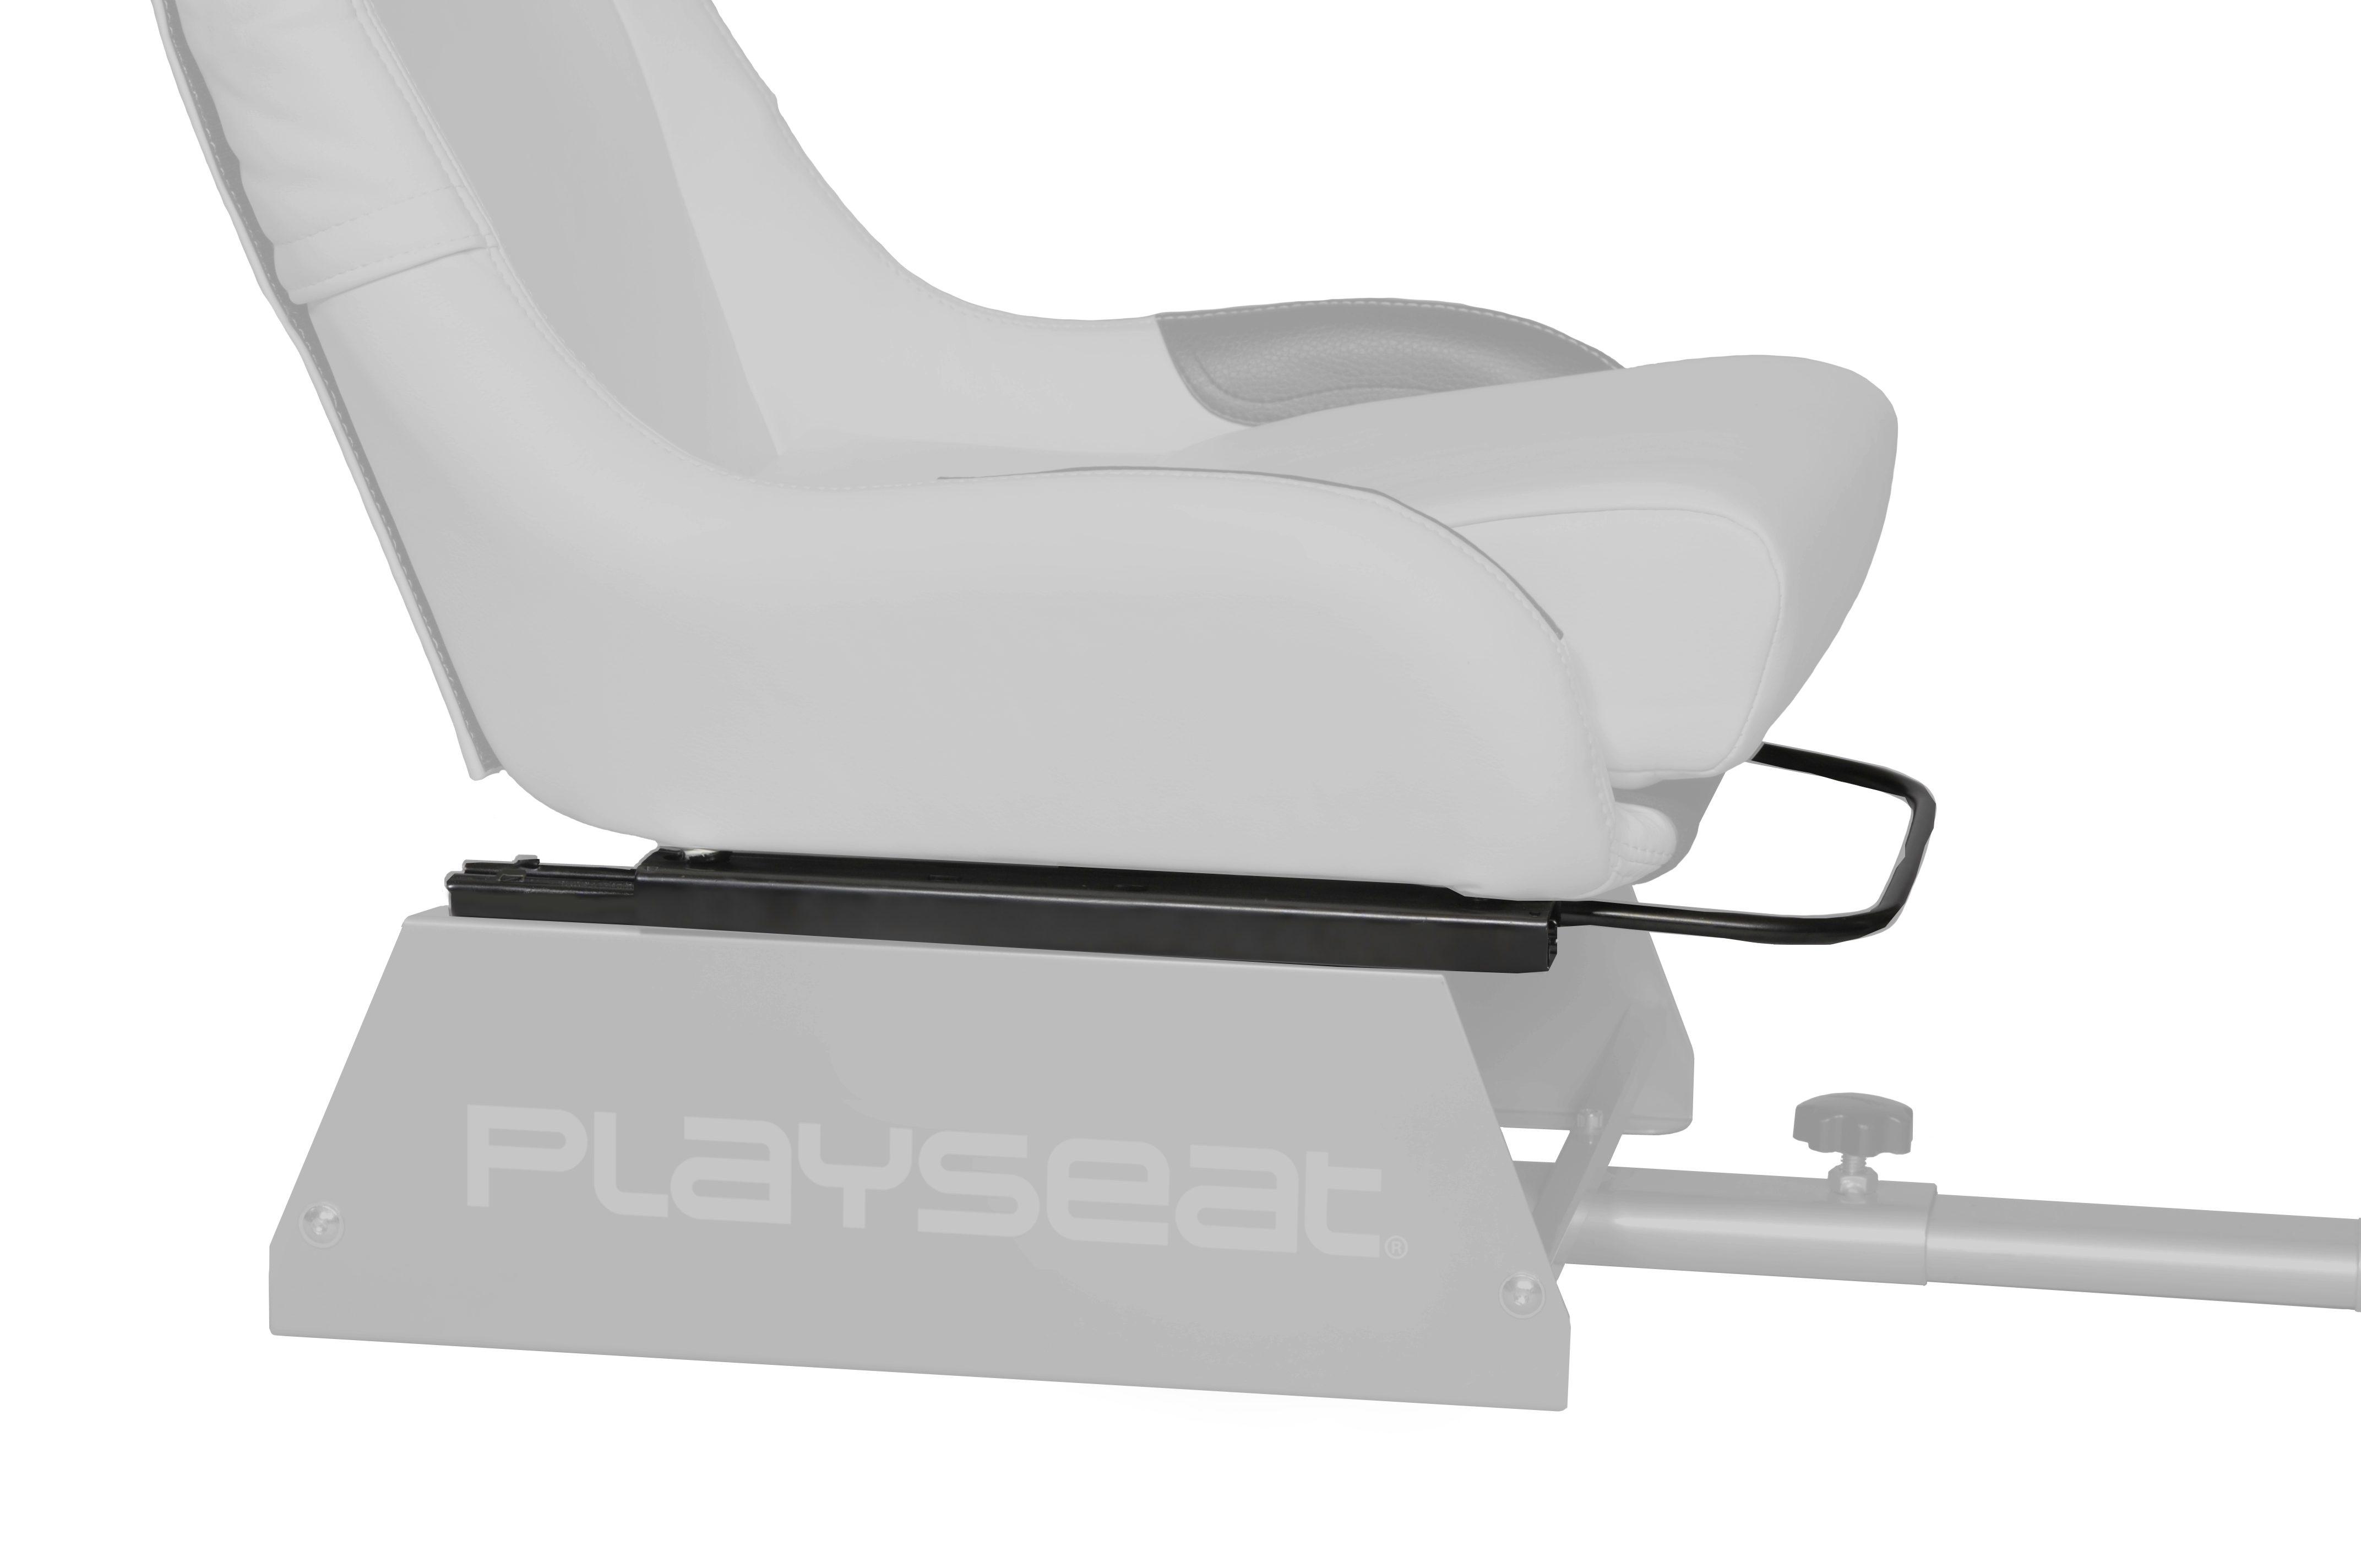 Playseats Sitzlaufschiene Playseat »PS3 PS4 X360 XBox One PC«